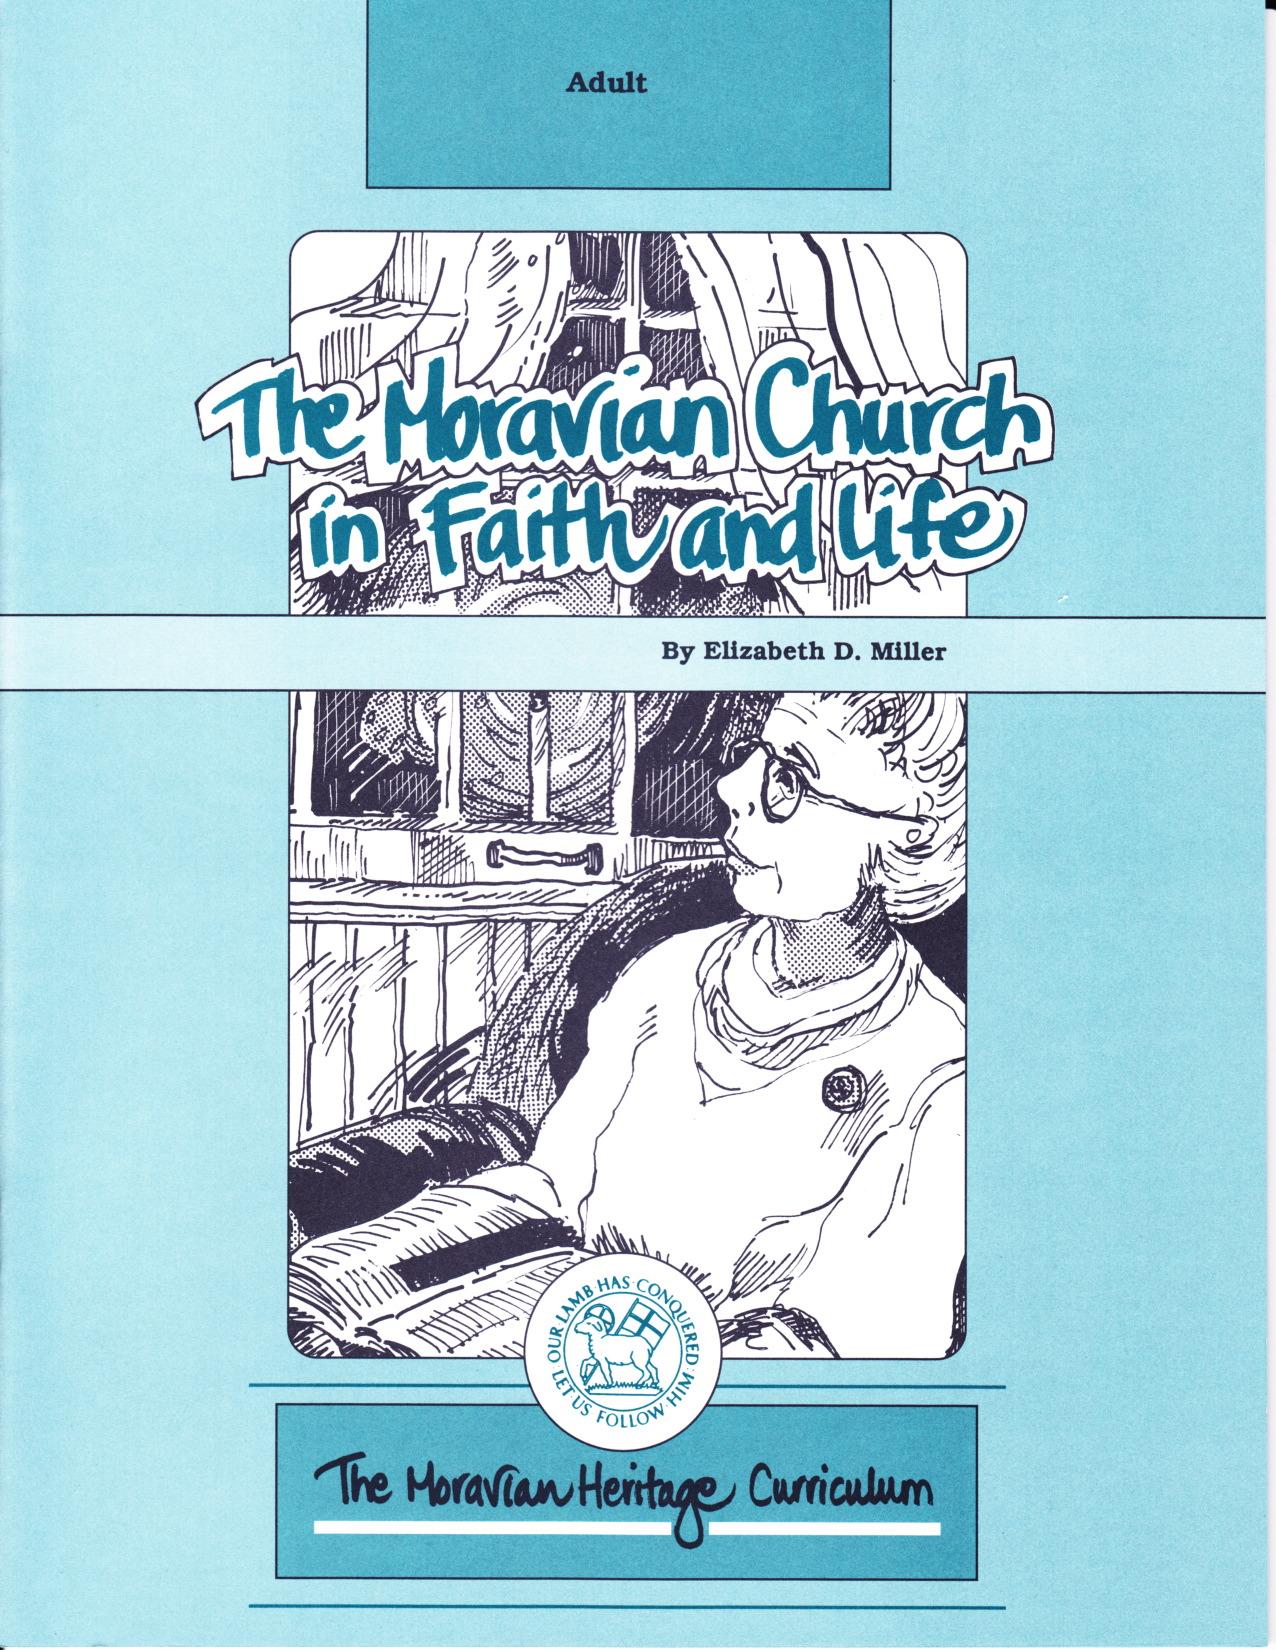 Moravian Heritage Curriculum, Adult